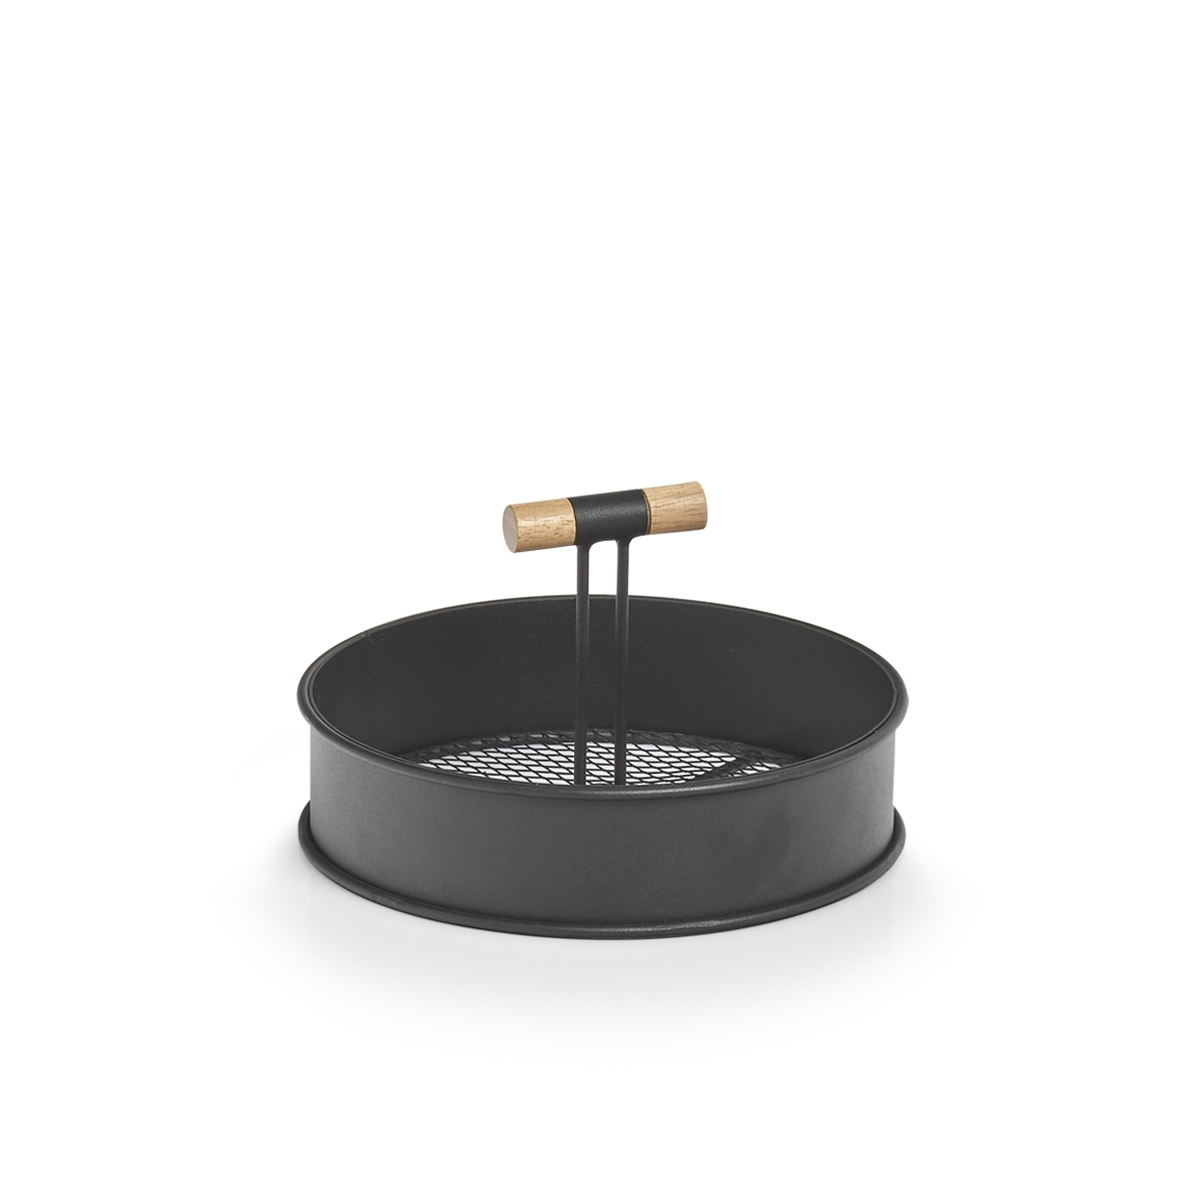 Tava pentru servire din metal, Wood Small Negru, Ø20xH11,6 cm imagine